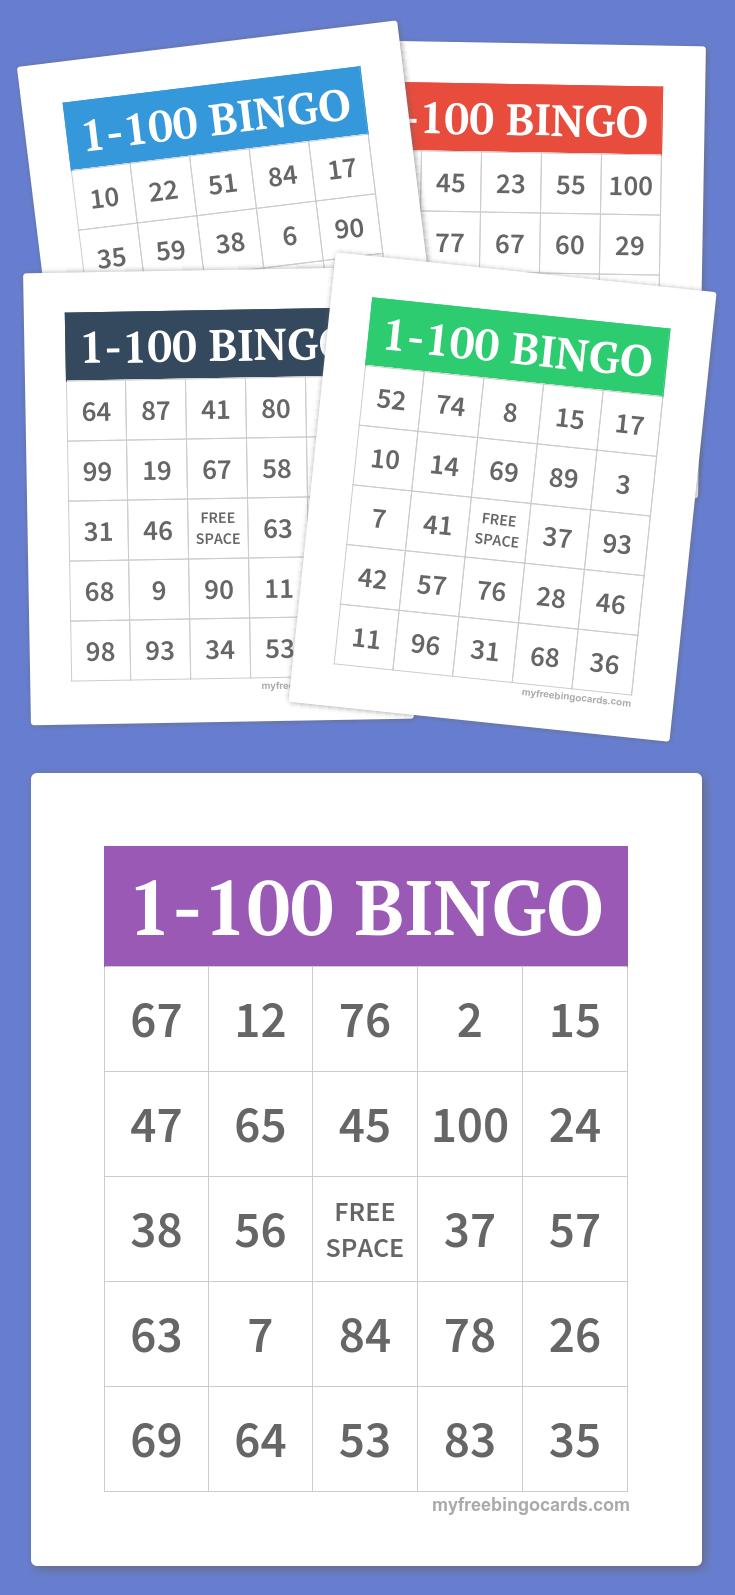 1-100 Bingo | Party Games | Pinterest | Bingo, Bingo Cards And Free - Free Printable Bingo Cards 1 100